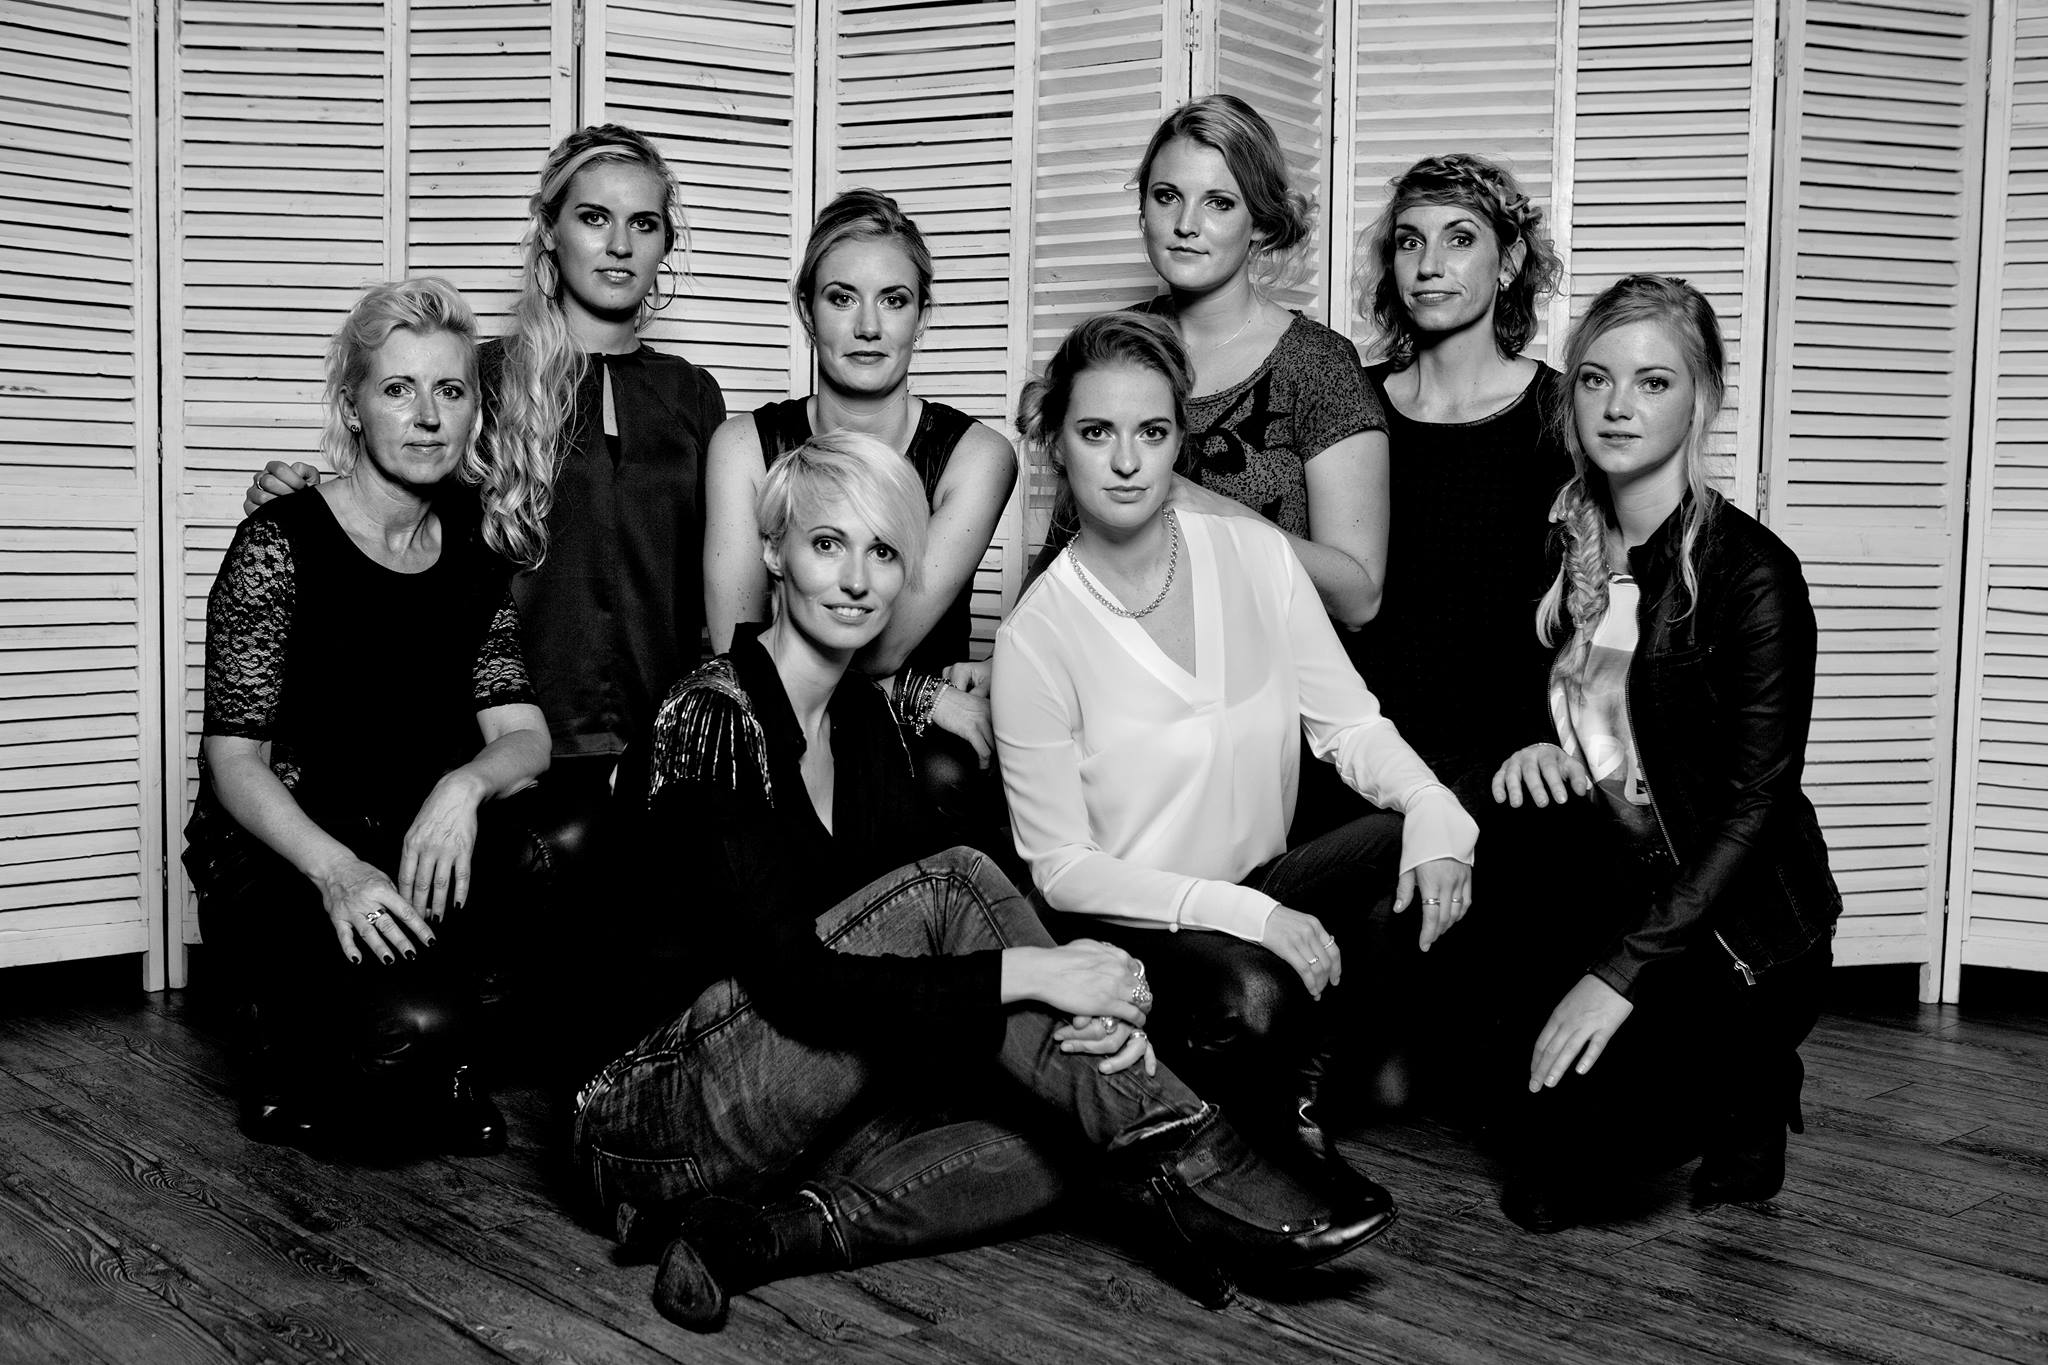 Rheino's, Wervershoof, mode, Spijkerbroek, Bovenkarspel